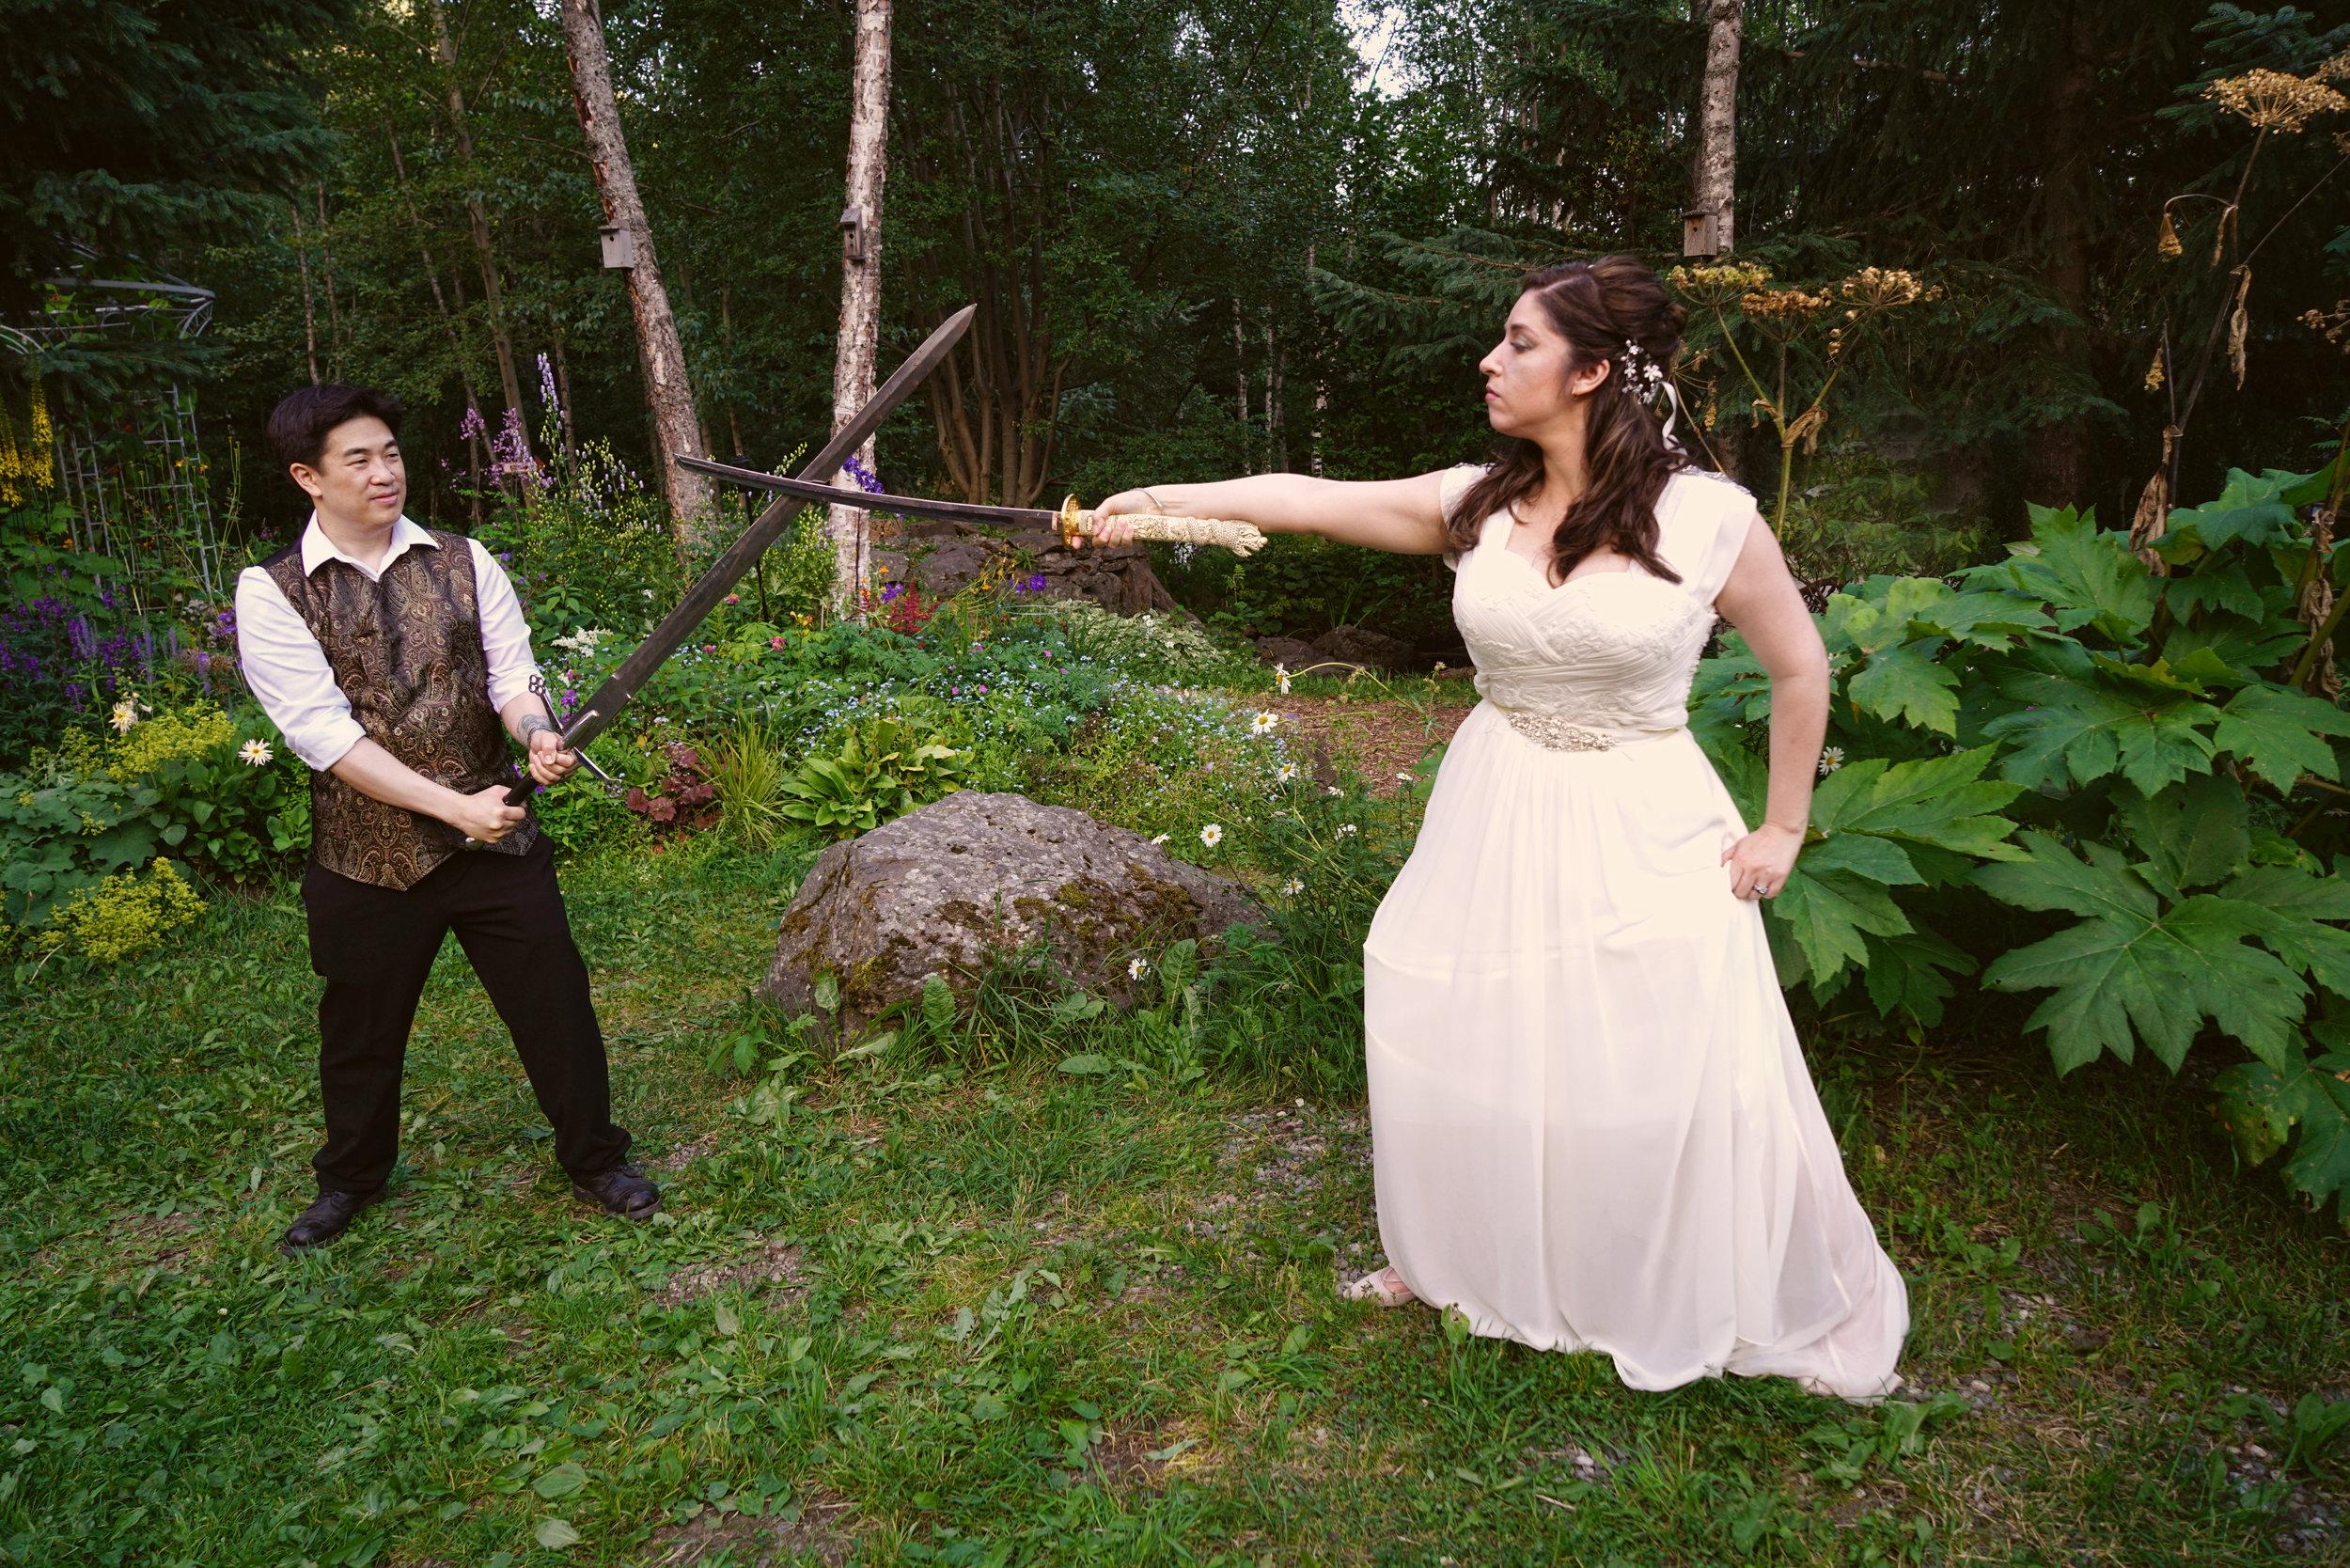 swords of wedding ak.jpg